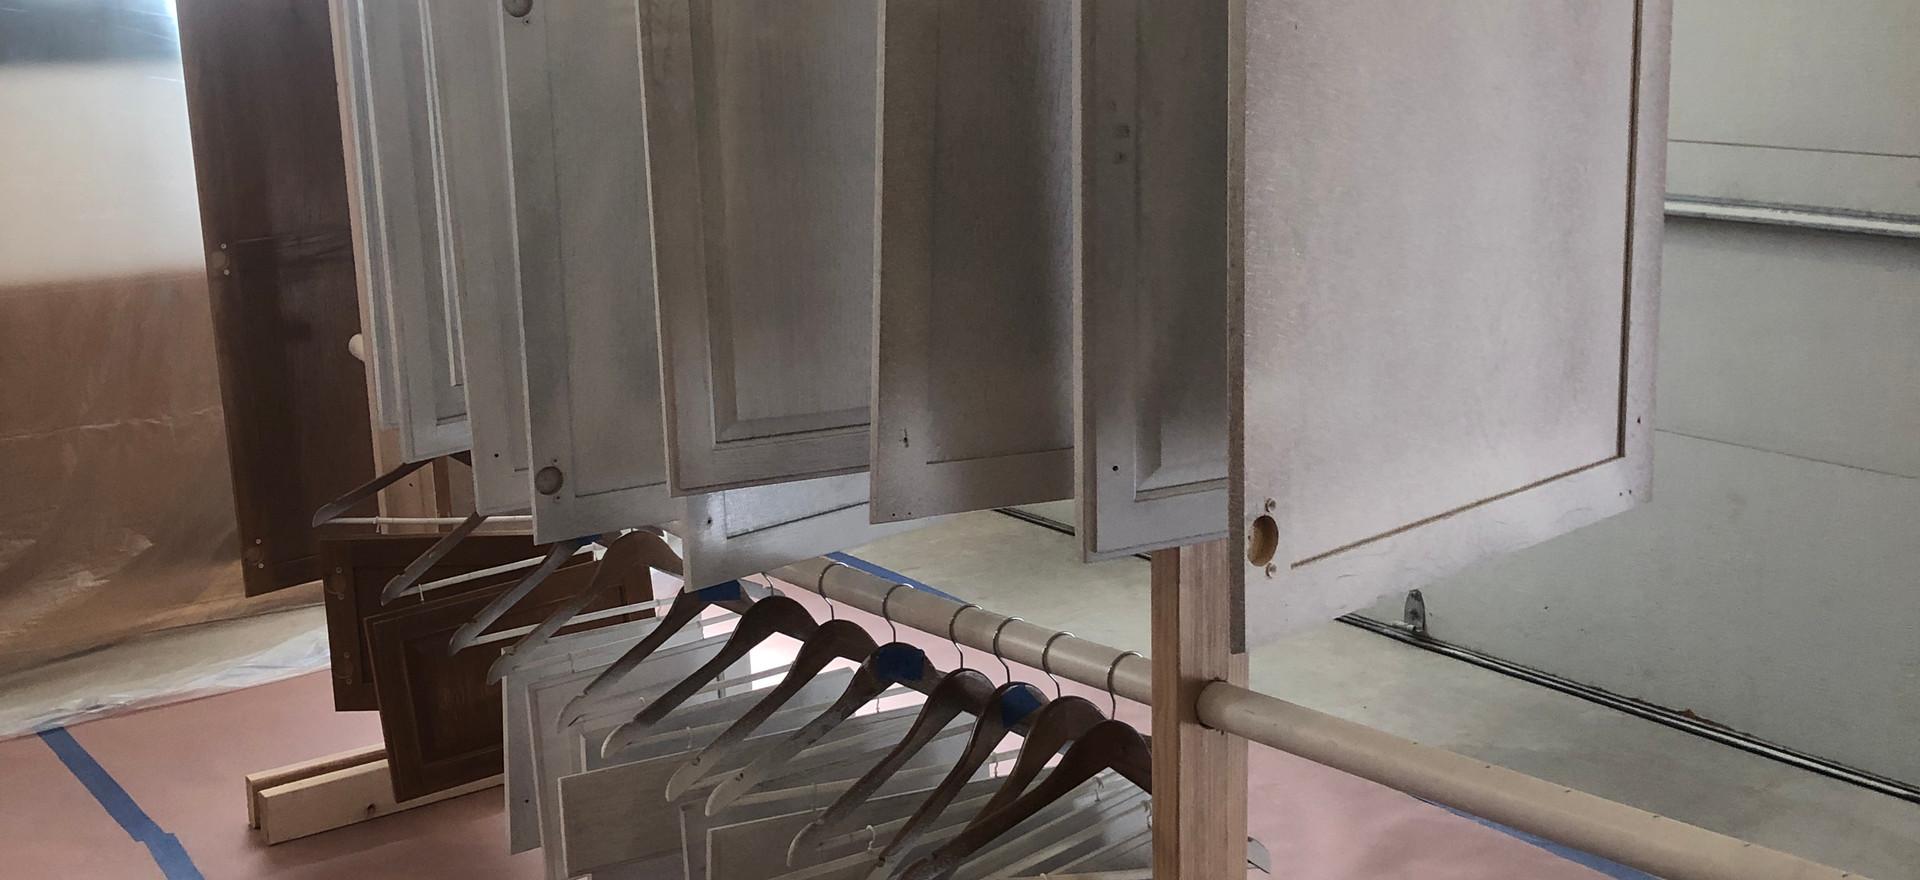 Hanging doors after primer coat